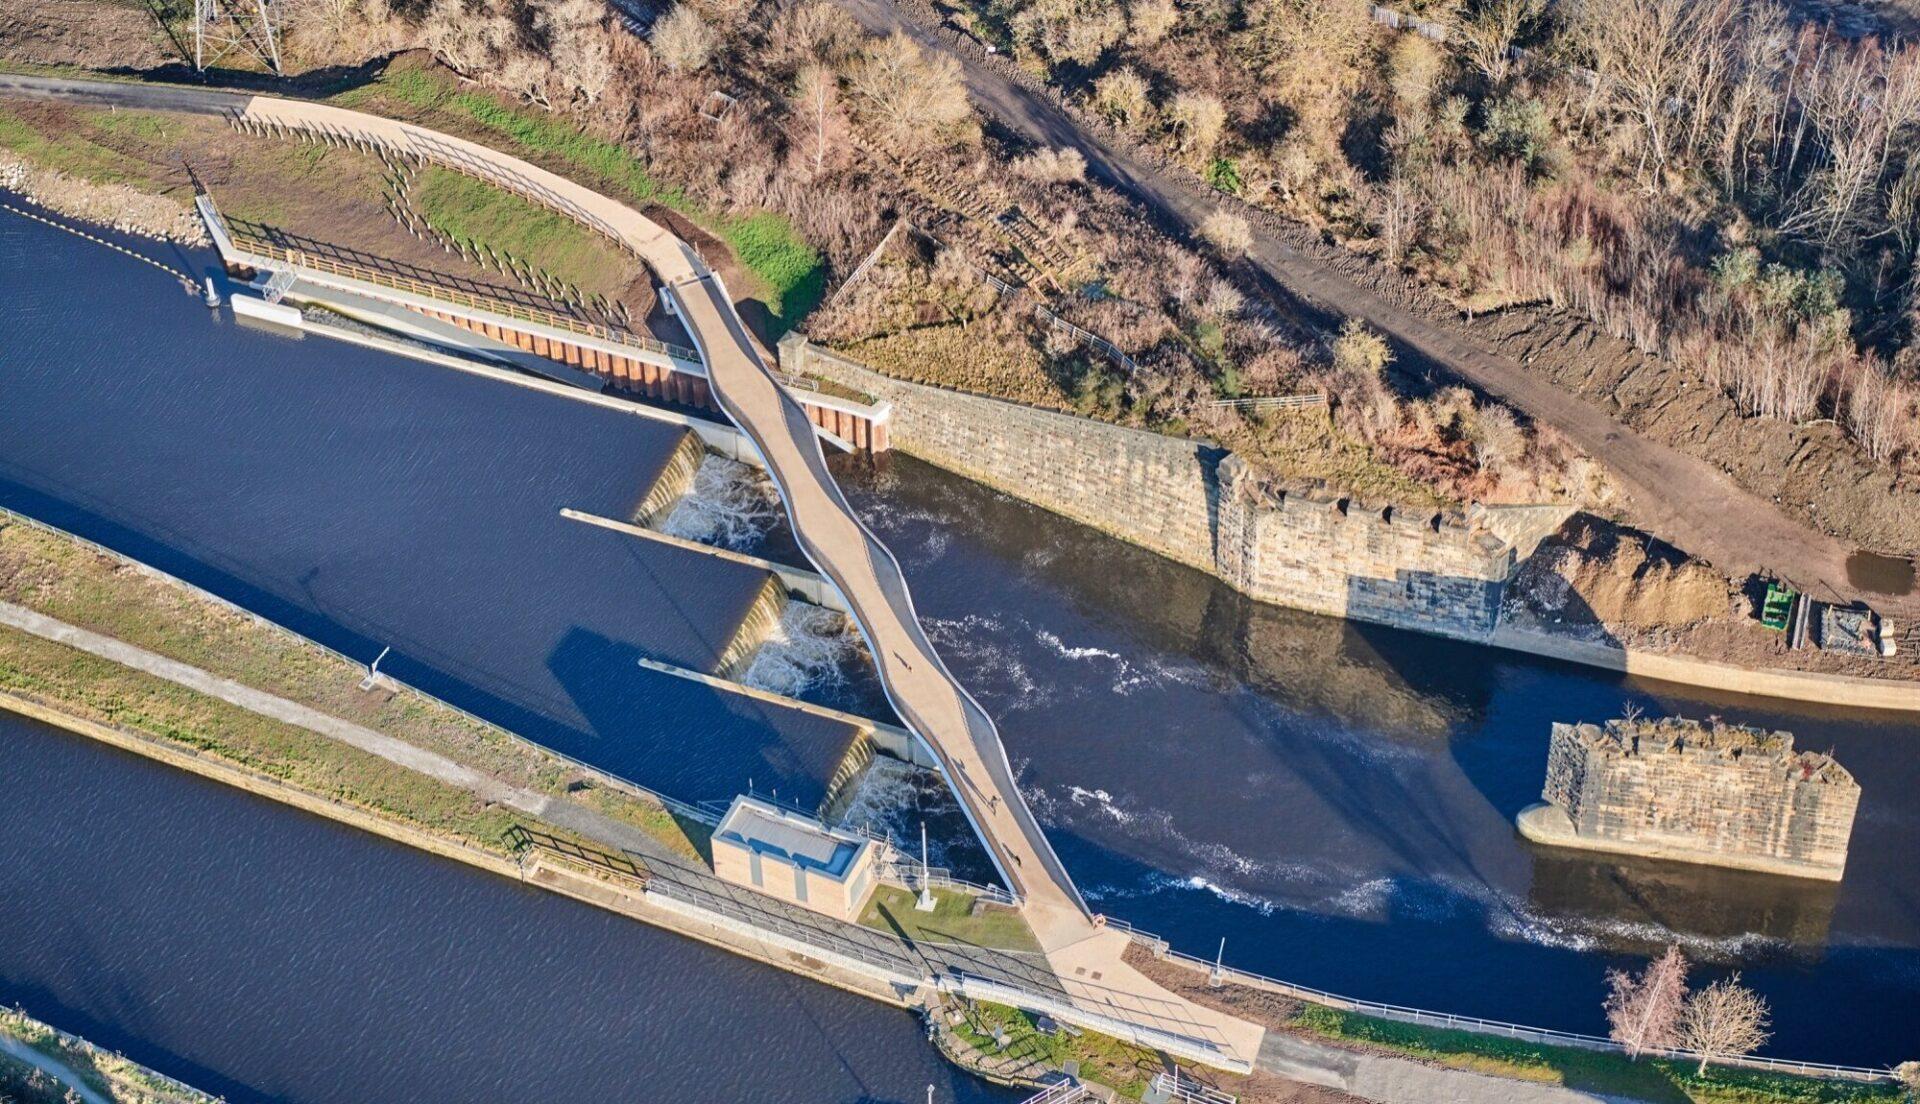 Aerial view of Knostrop bridge